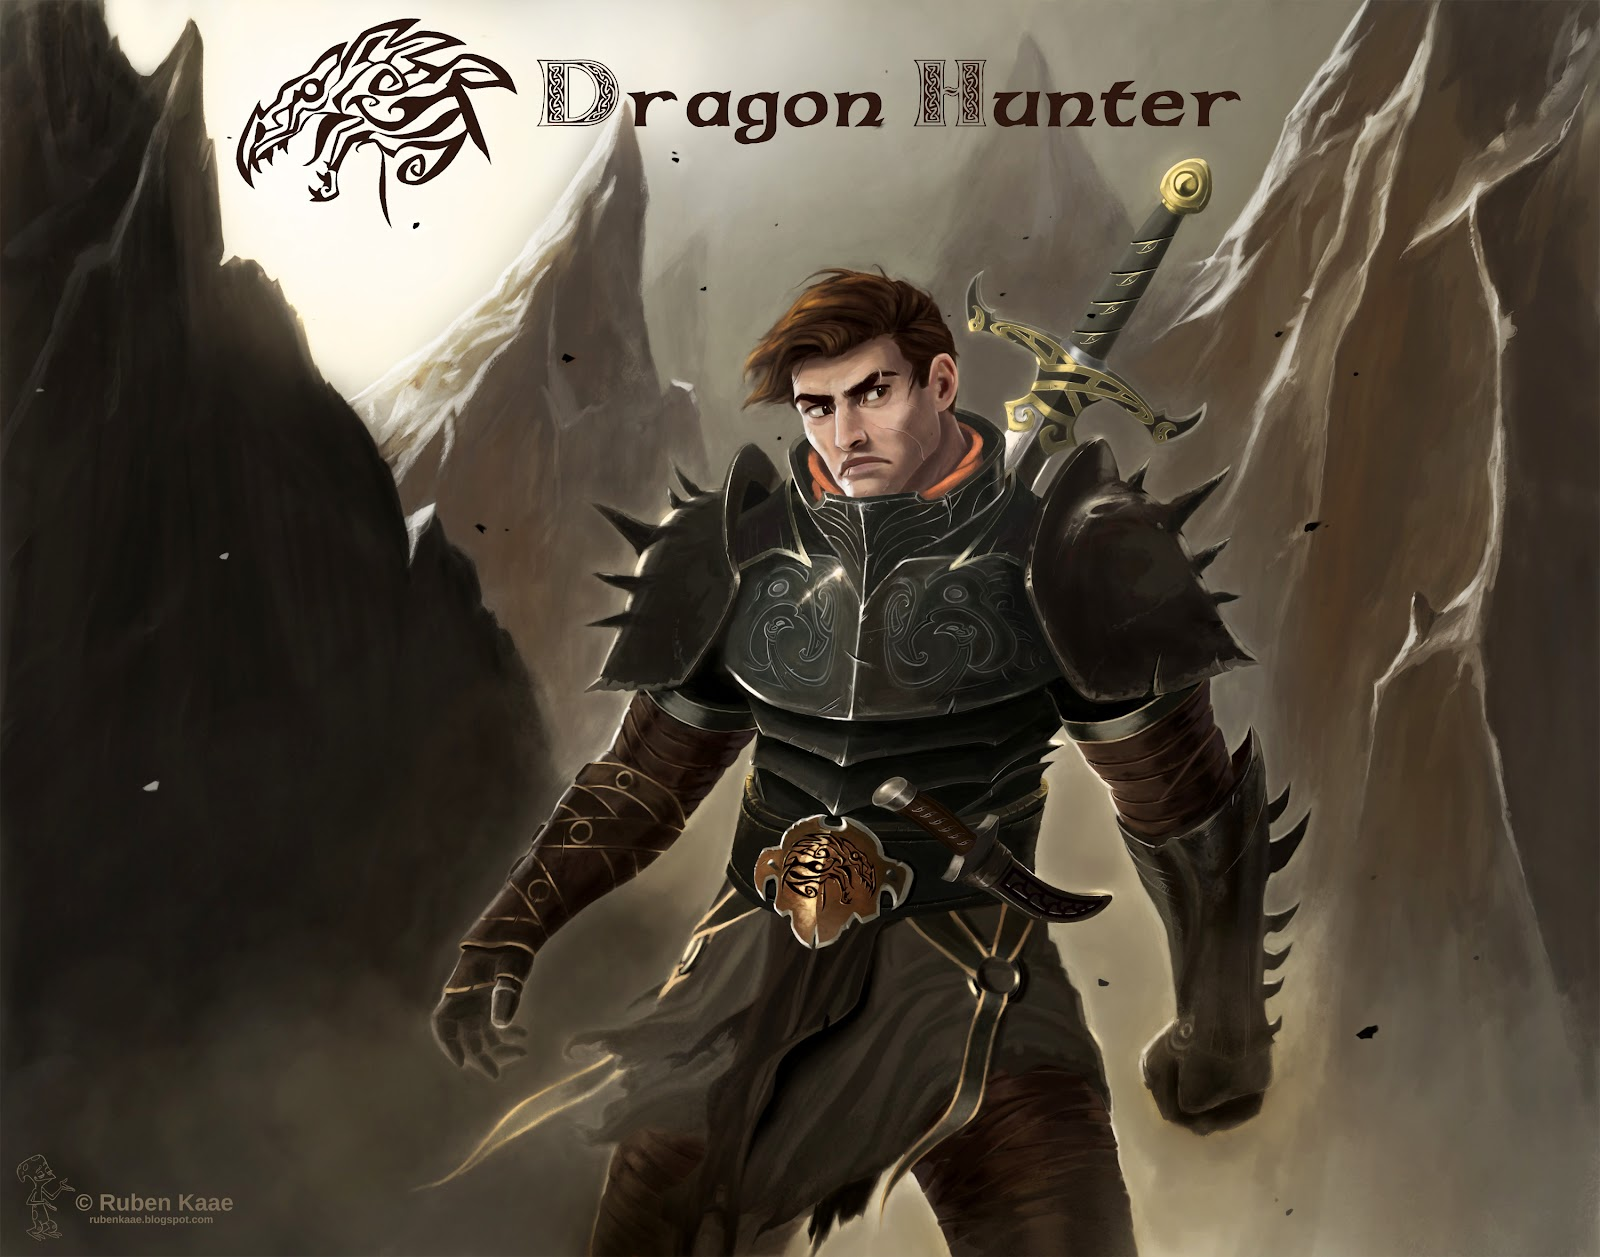 http://1.bp.blogspot.com/-Qus6Qt3J1gQ/T6QzN56fmVI/AAAAAAAACDE/YvDfgL8fRJ0/s1600/Dragon+Hunter+3000x2356.jpg